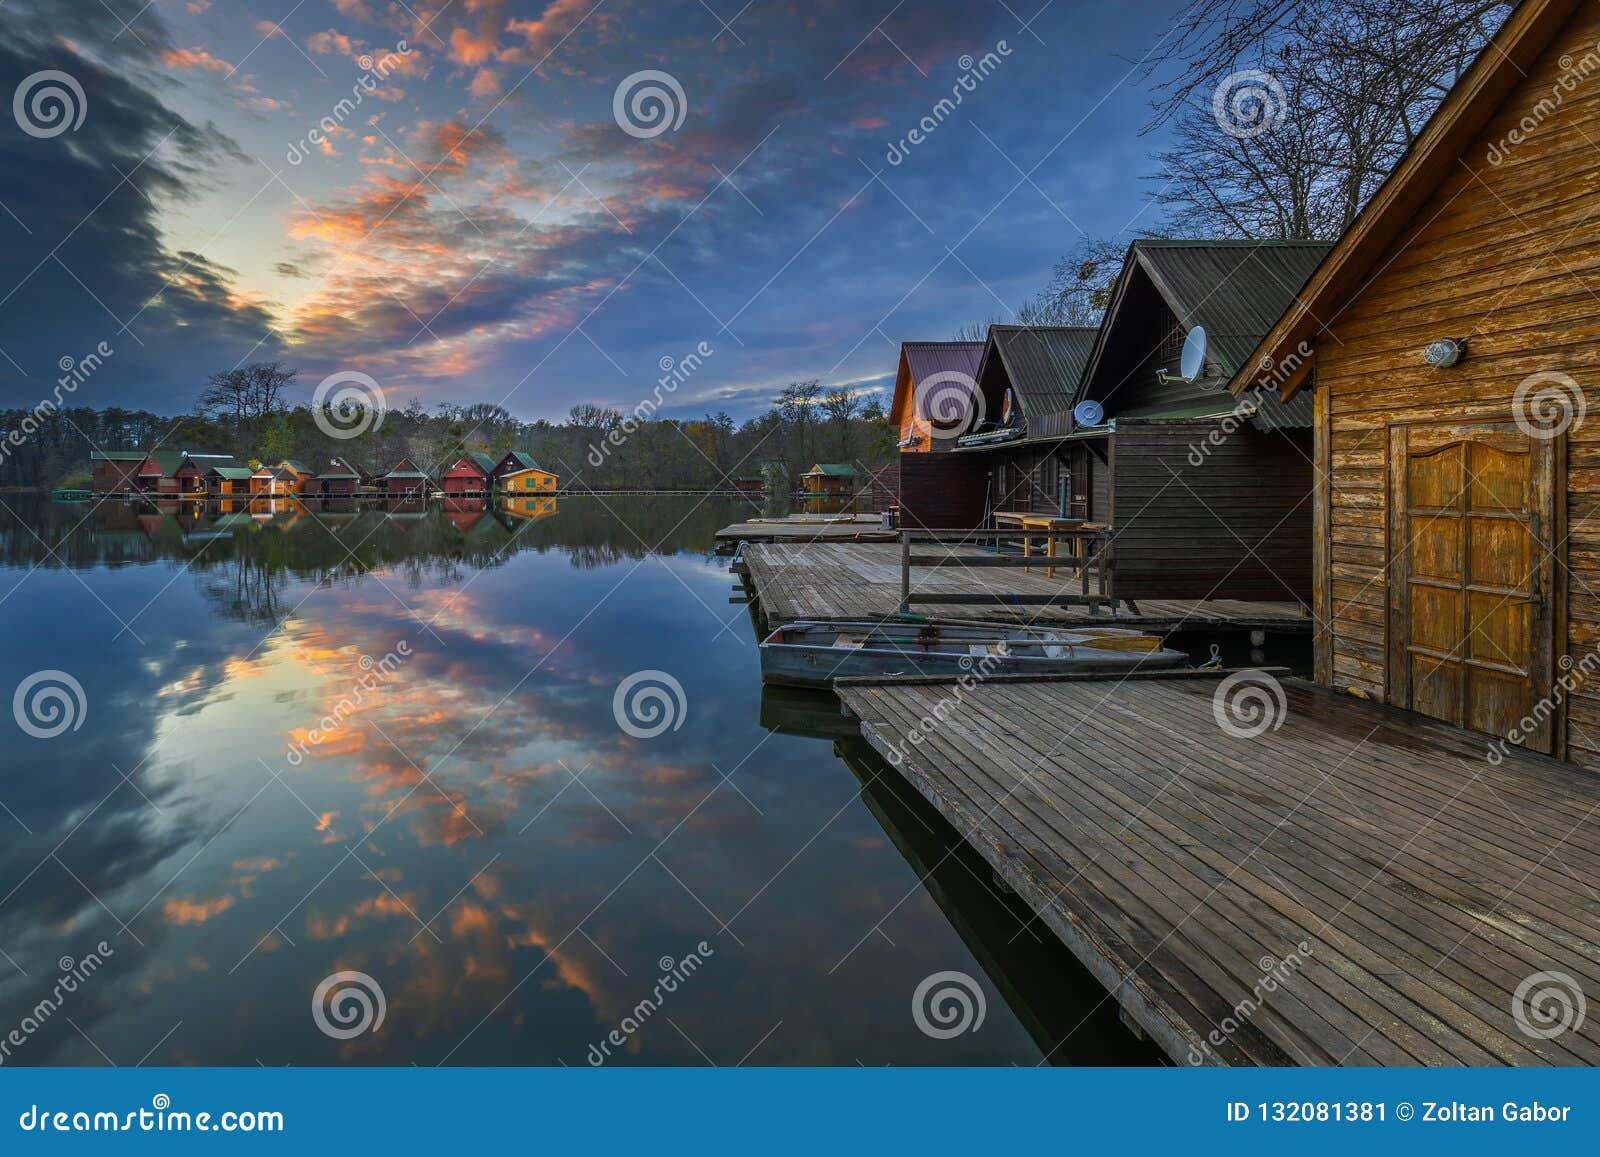 Tata, Hungary - Beautiful Sunset Over Lake Derito Derito To